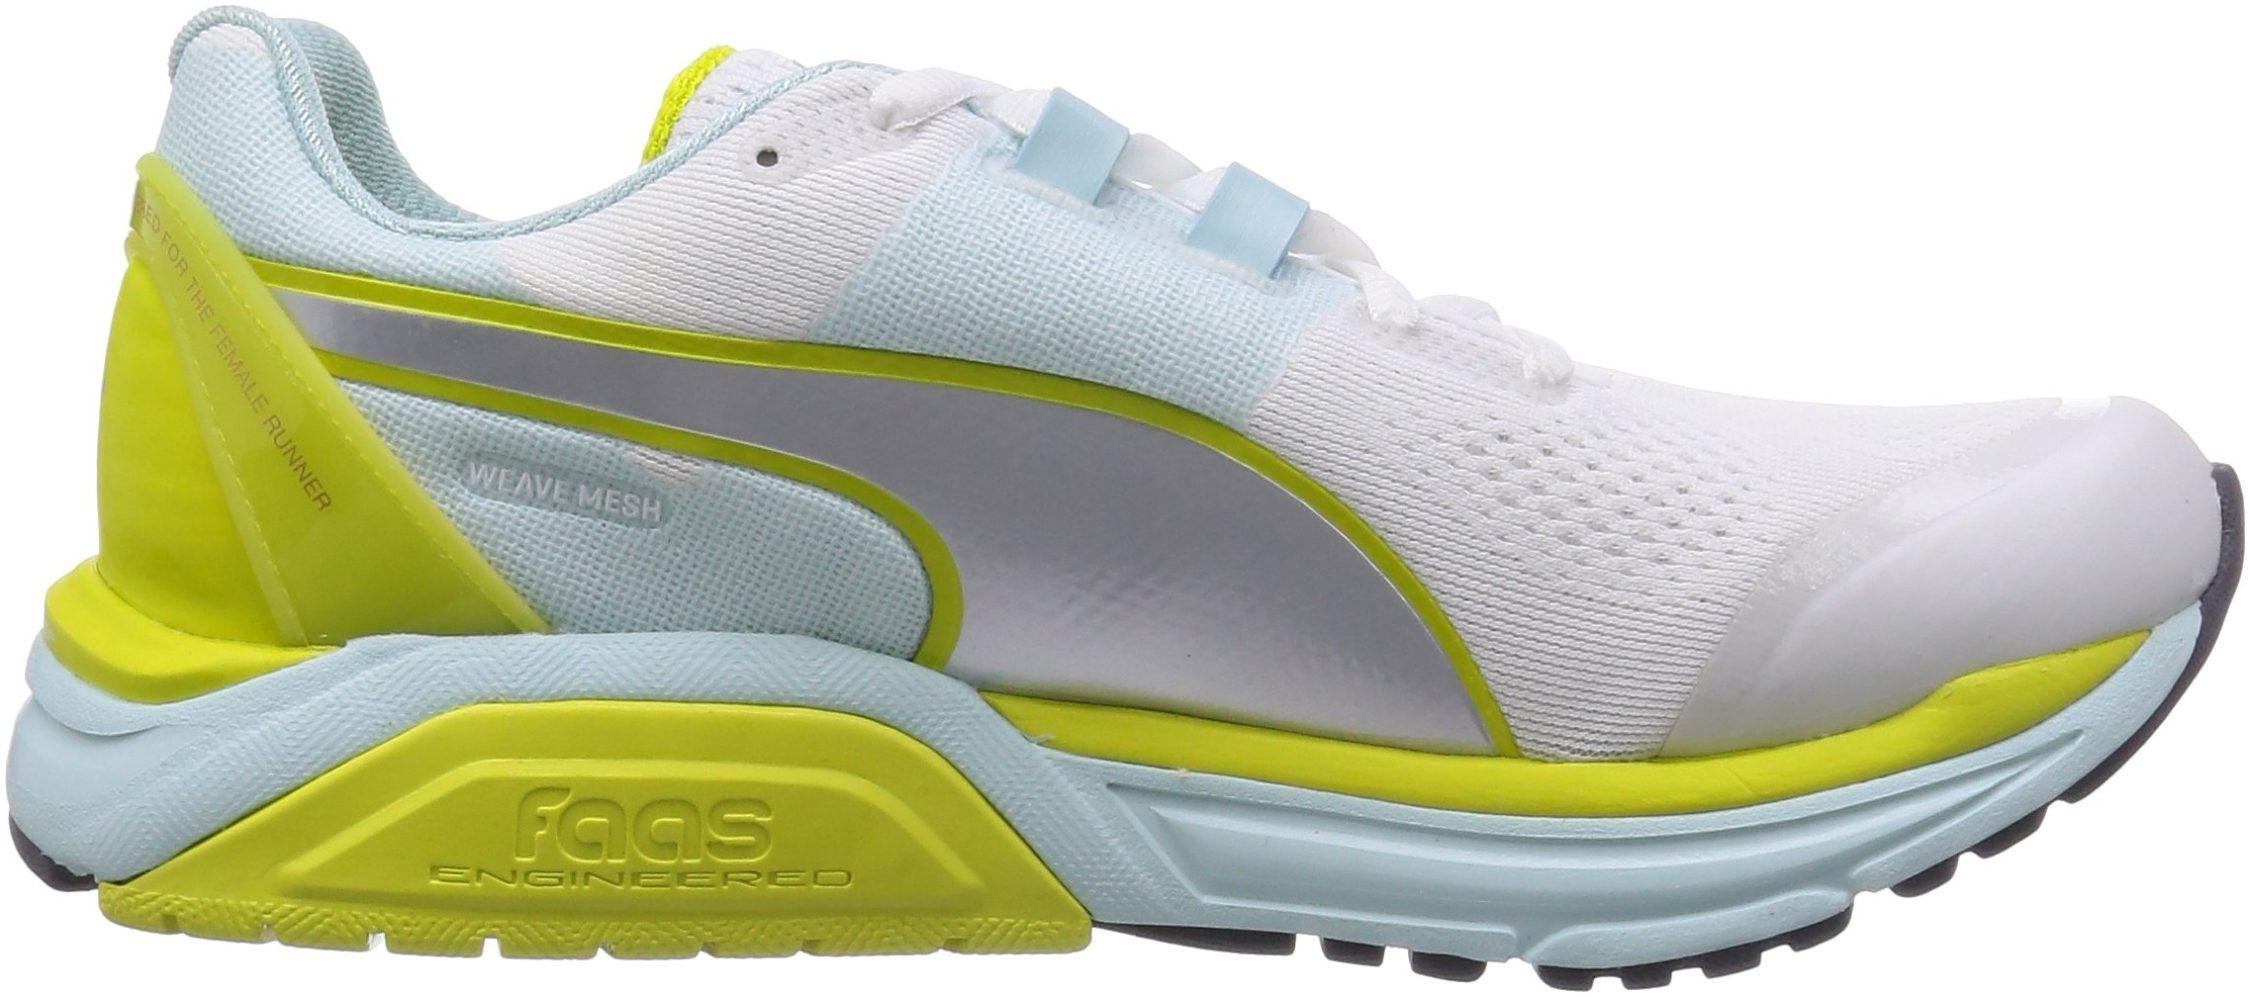 Puma Stability Running Shoes (4 Models